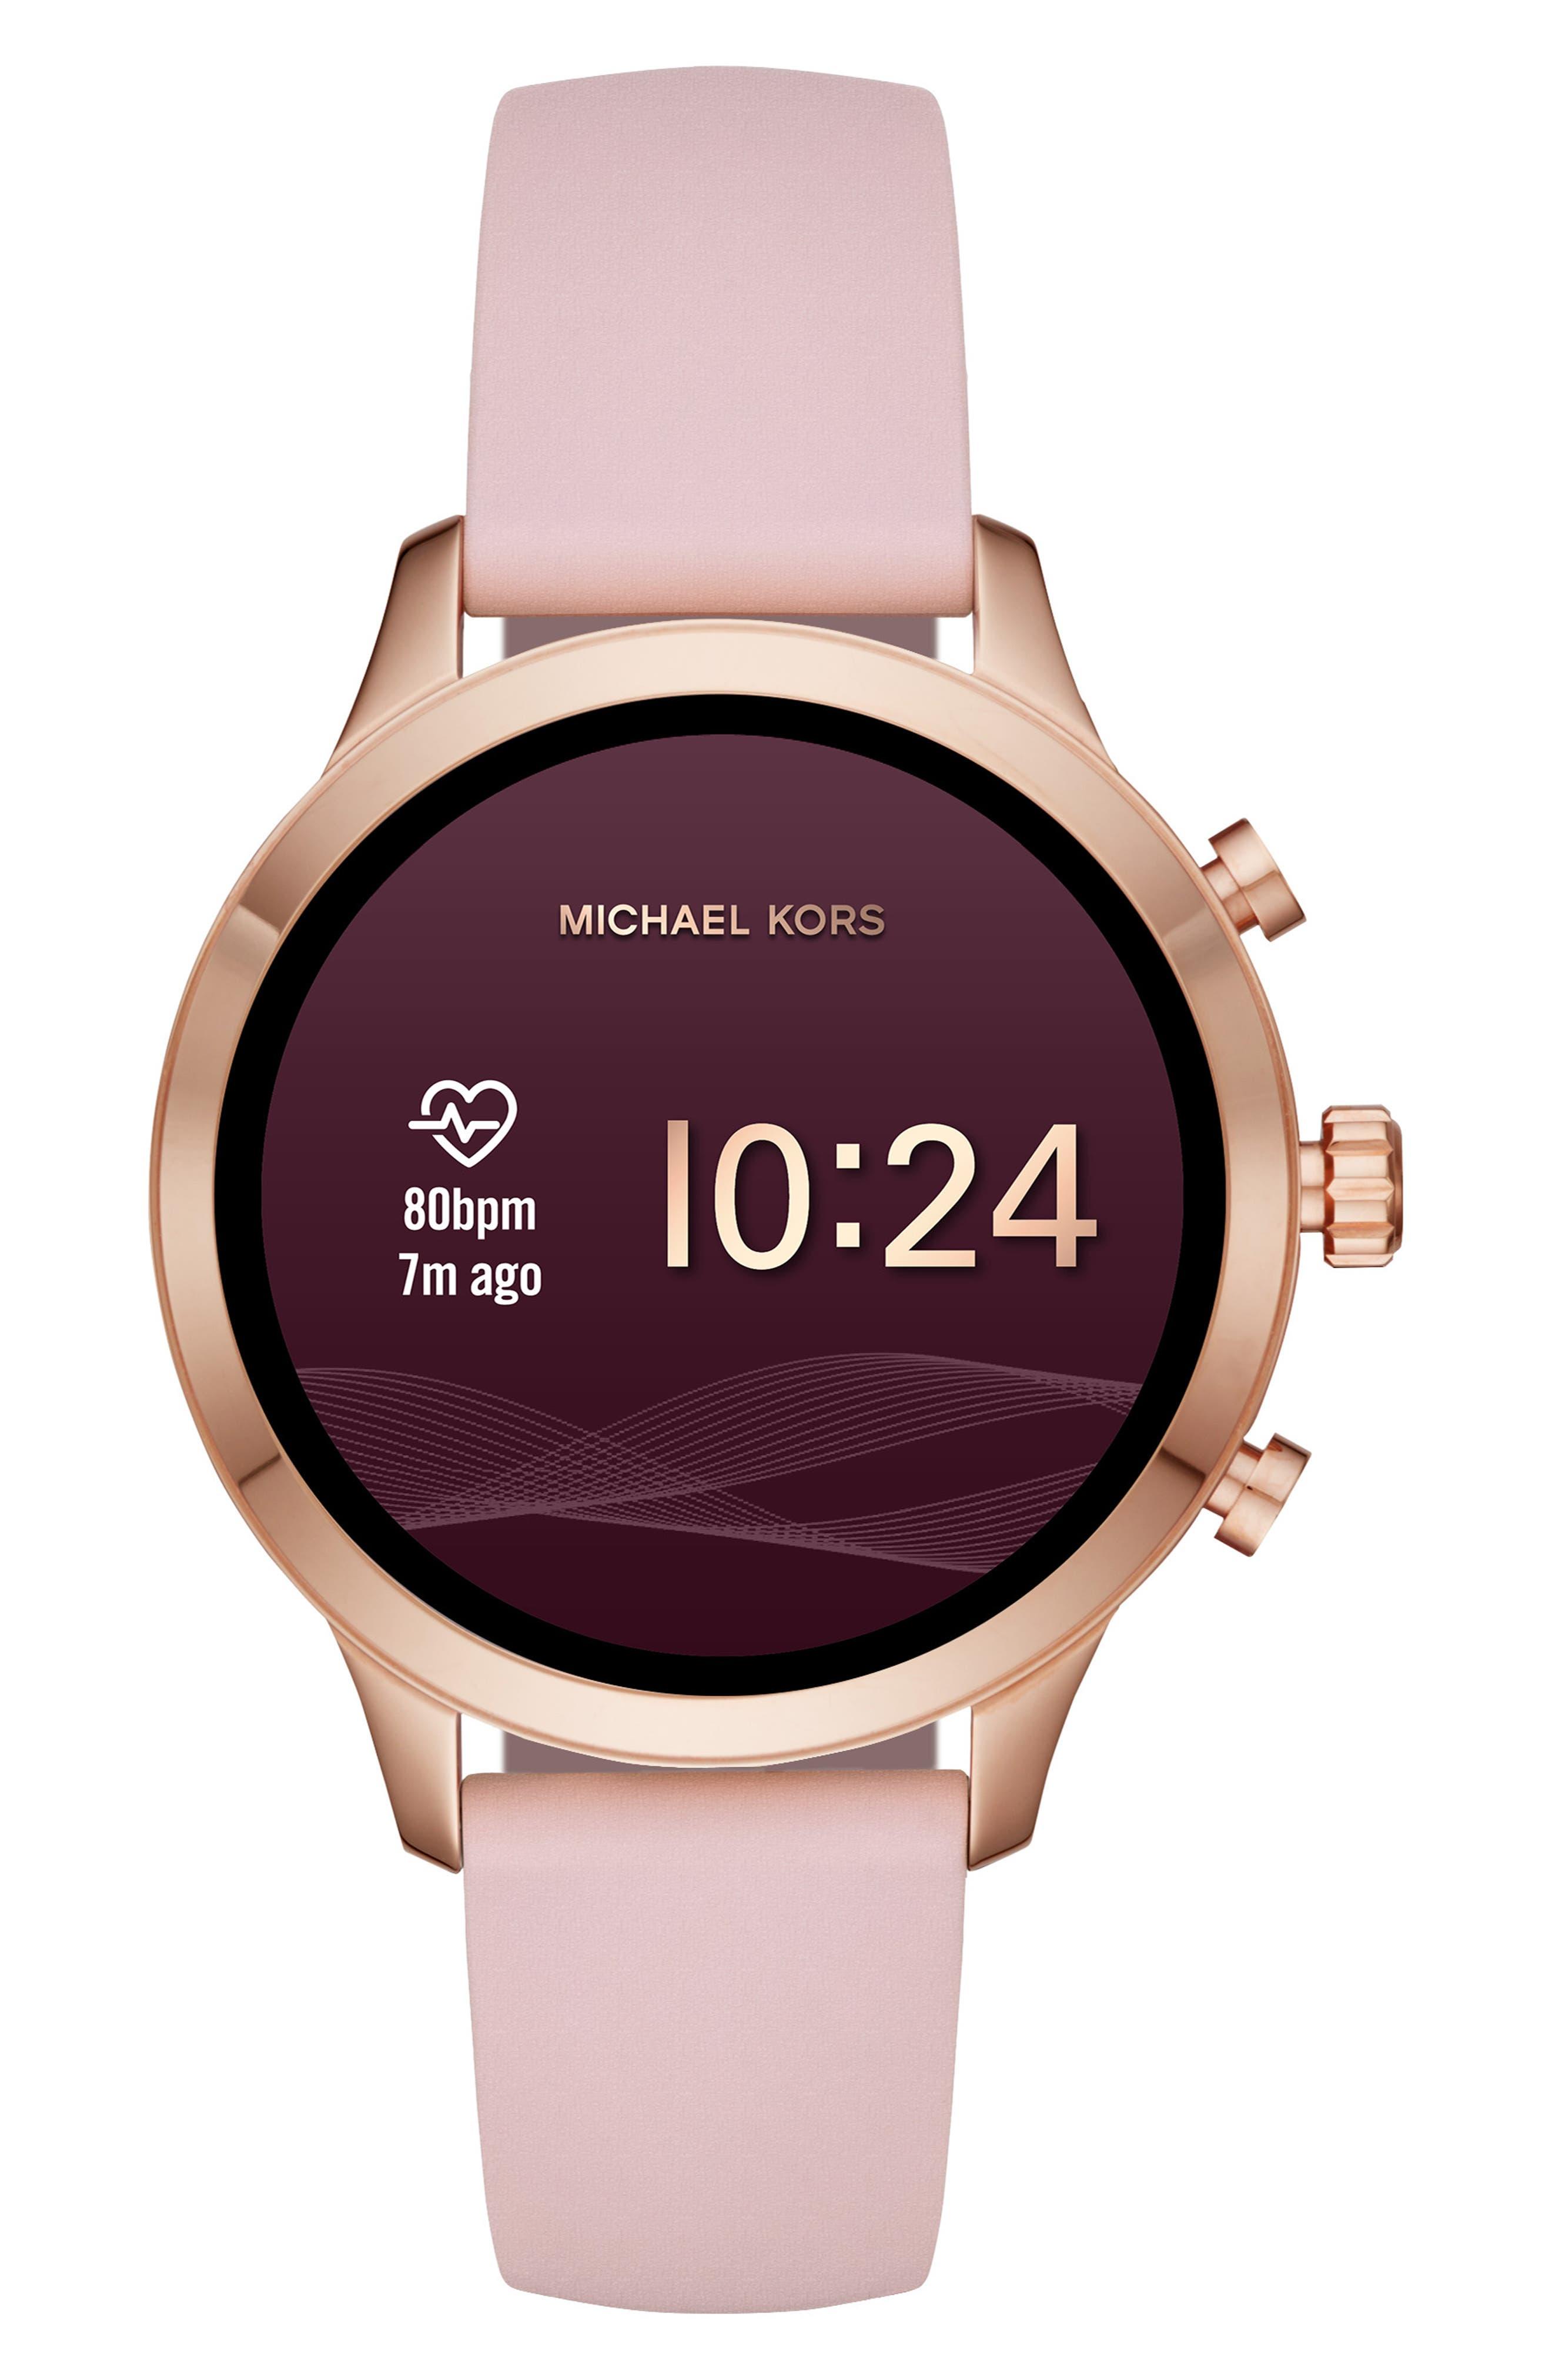 MICHAEL KORS,                             MICHAEL Michael Kors Access Runway Smart Watch, 41mm,                             Alternate thumbnail 5, color,                             PINK/ ROSE GOLD